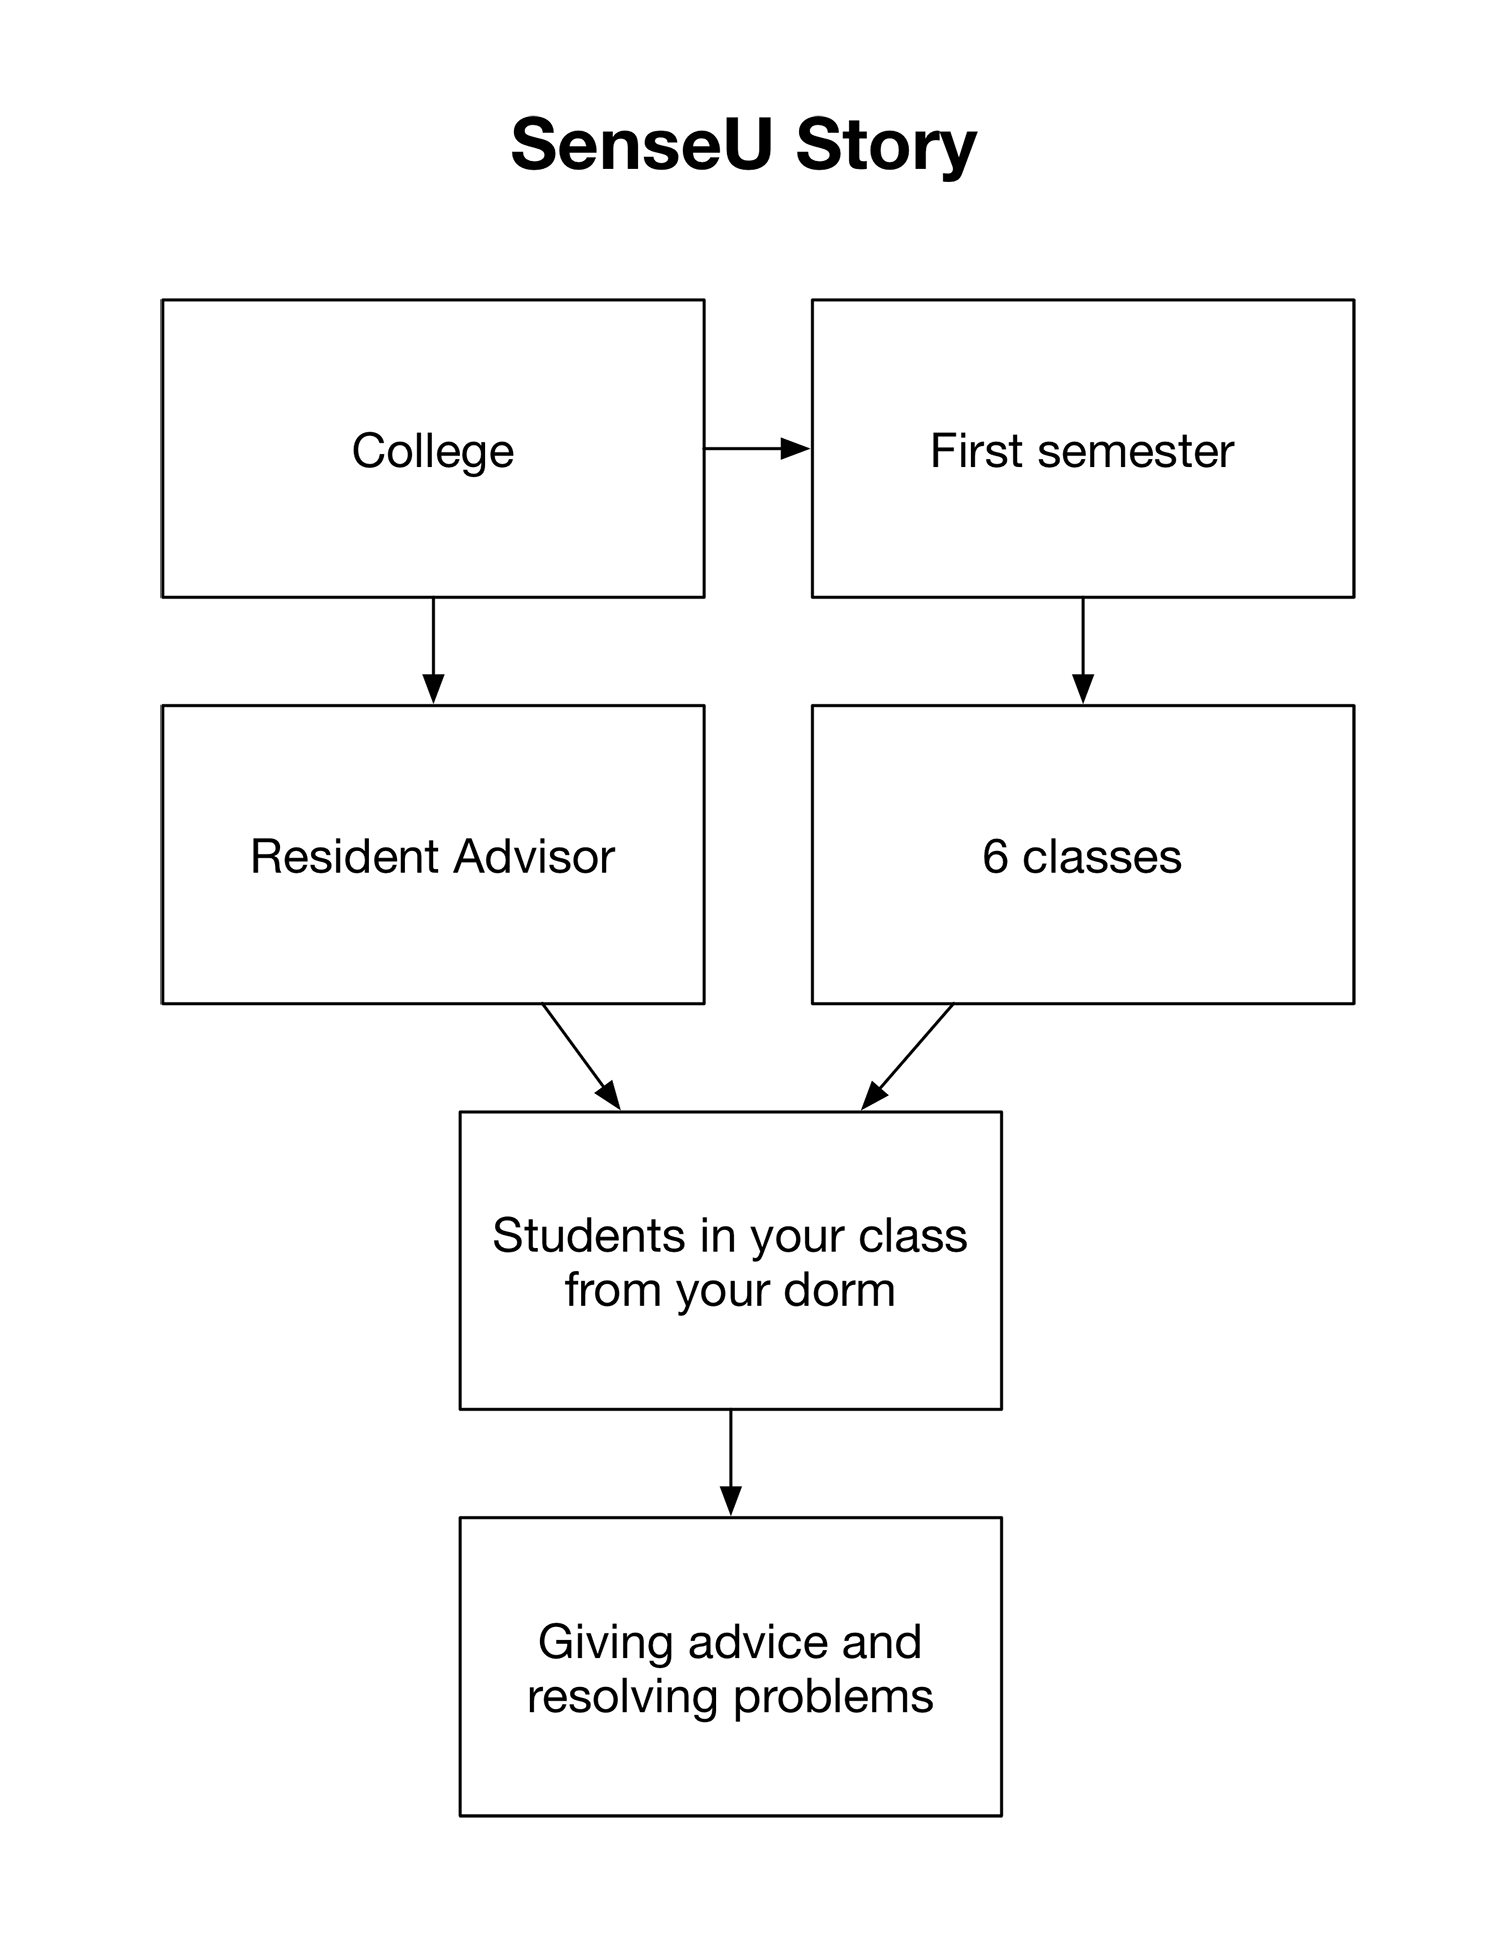 Academic writing skills esl activities for students College - Politieke ...